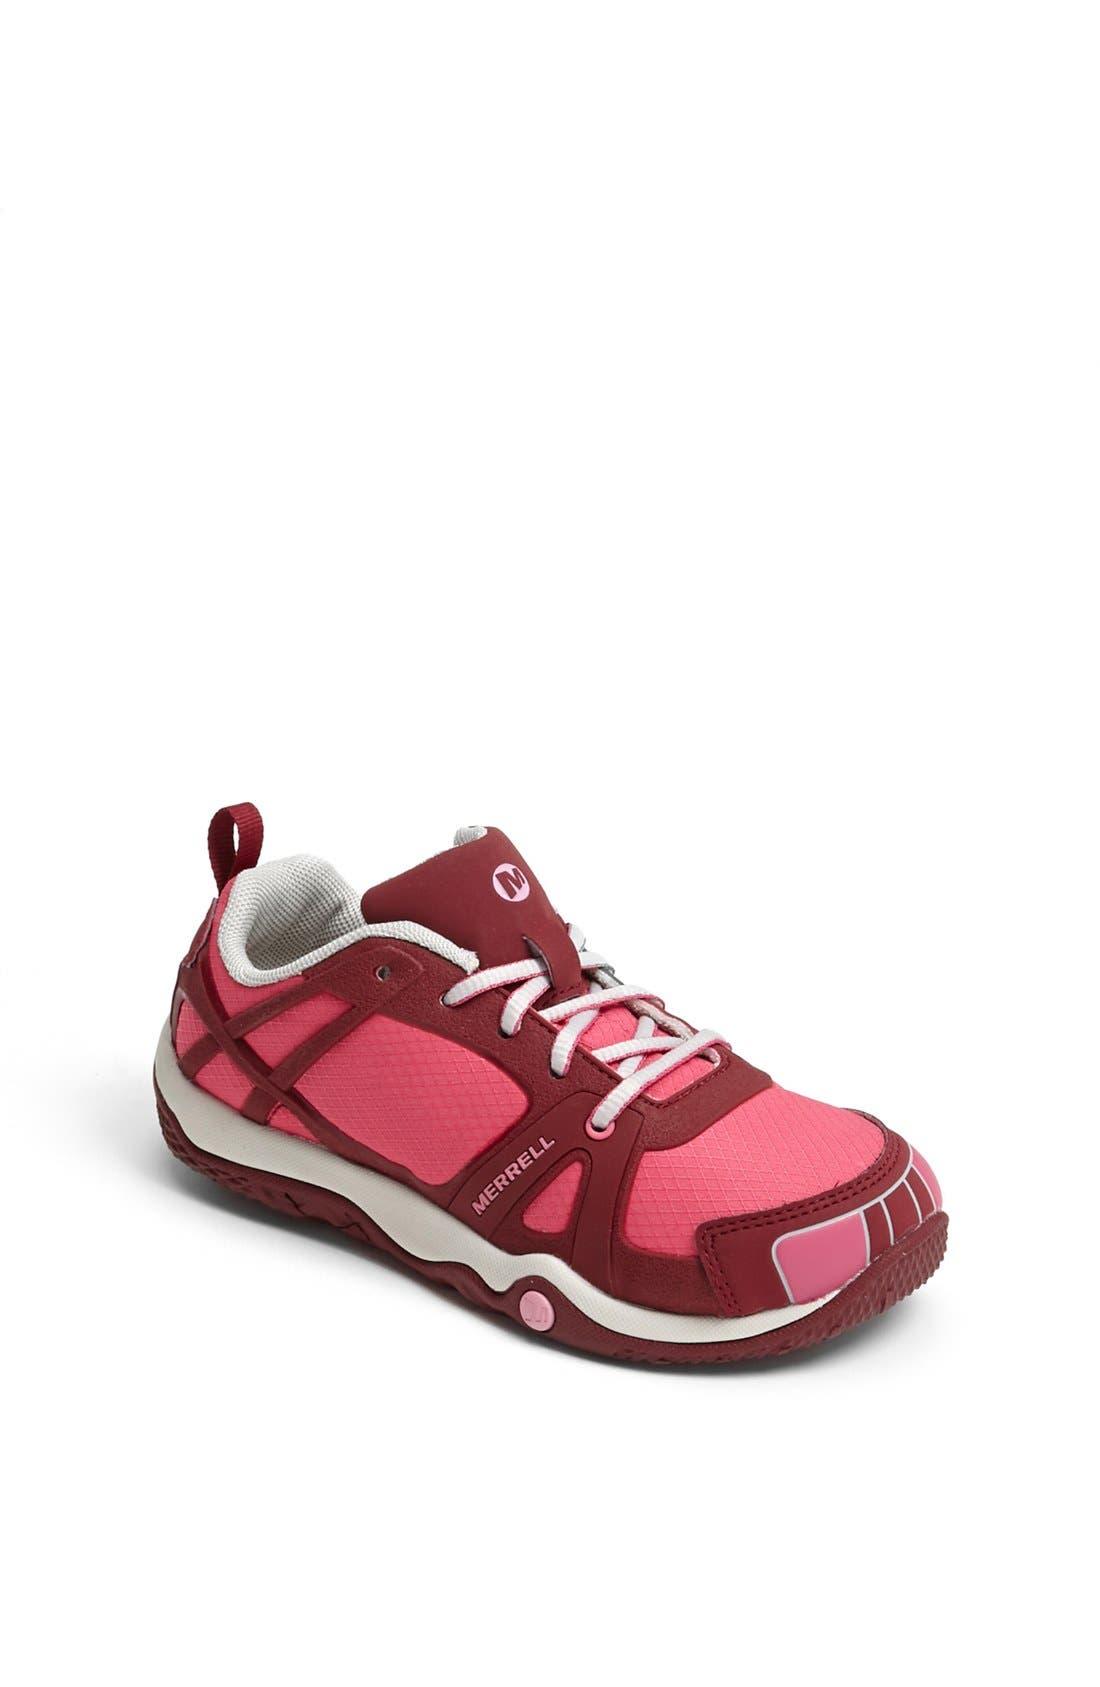 Main Image - Merrell 'Proterra Sport' Sneaker (Toddler, Little Kid & Big Kid)